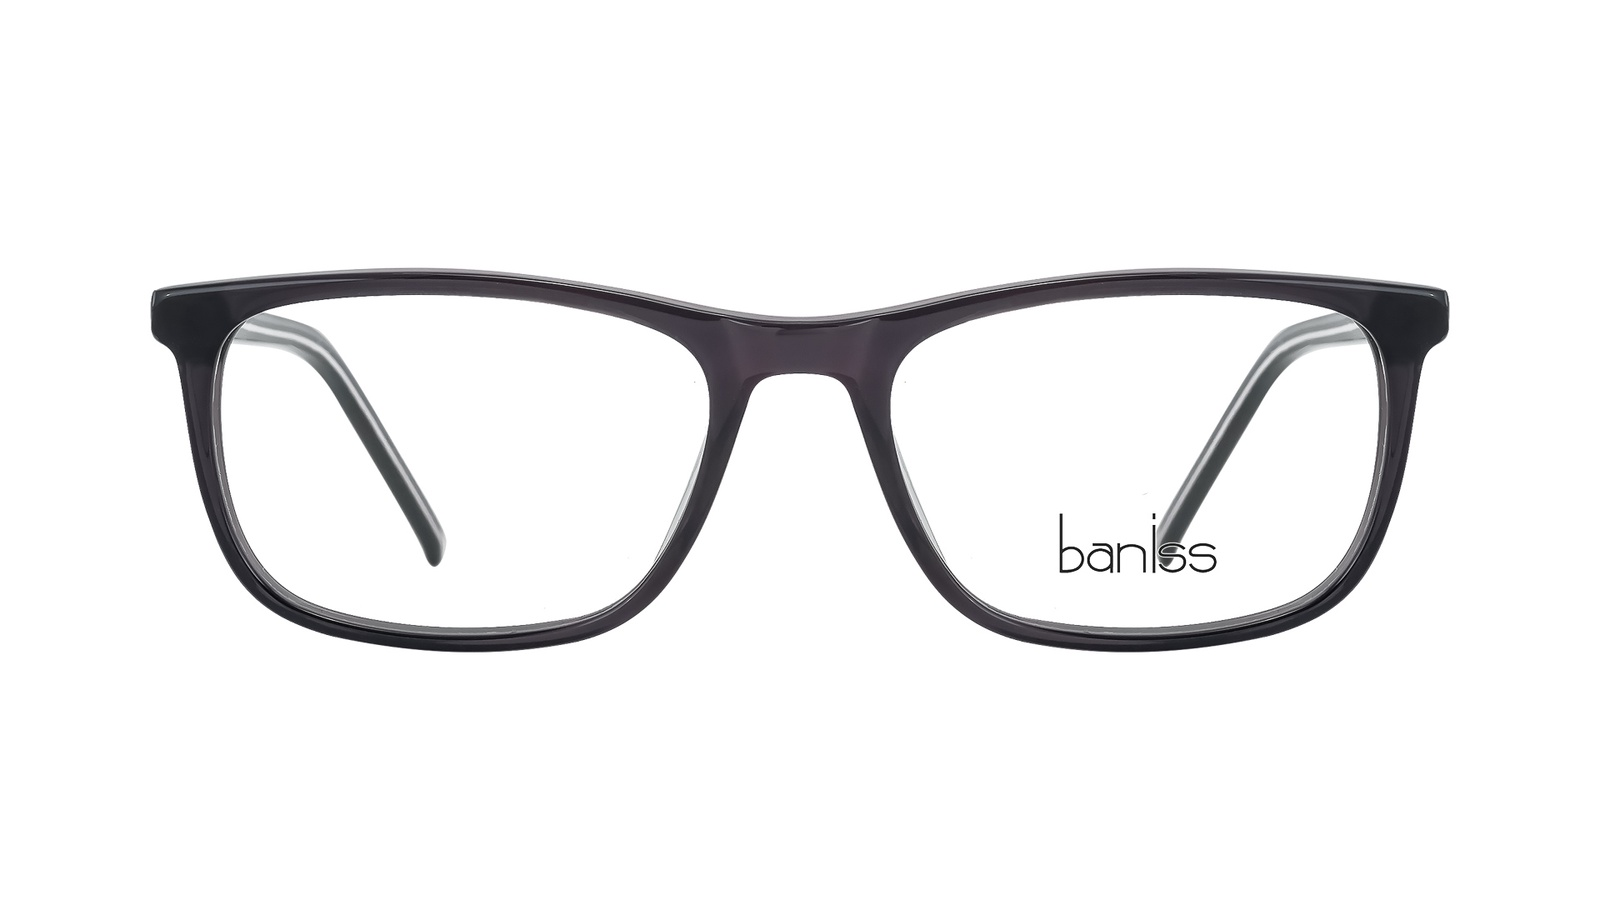 Оправа для очков, BANISS, пластик, BS8023 C02